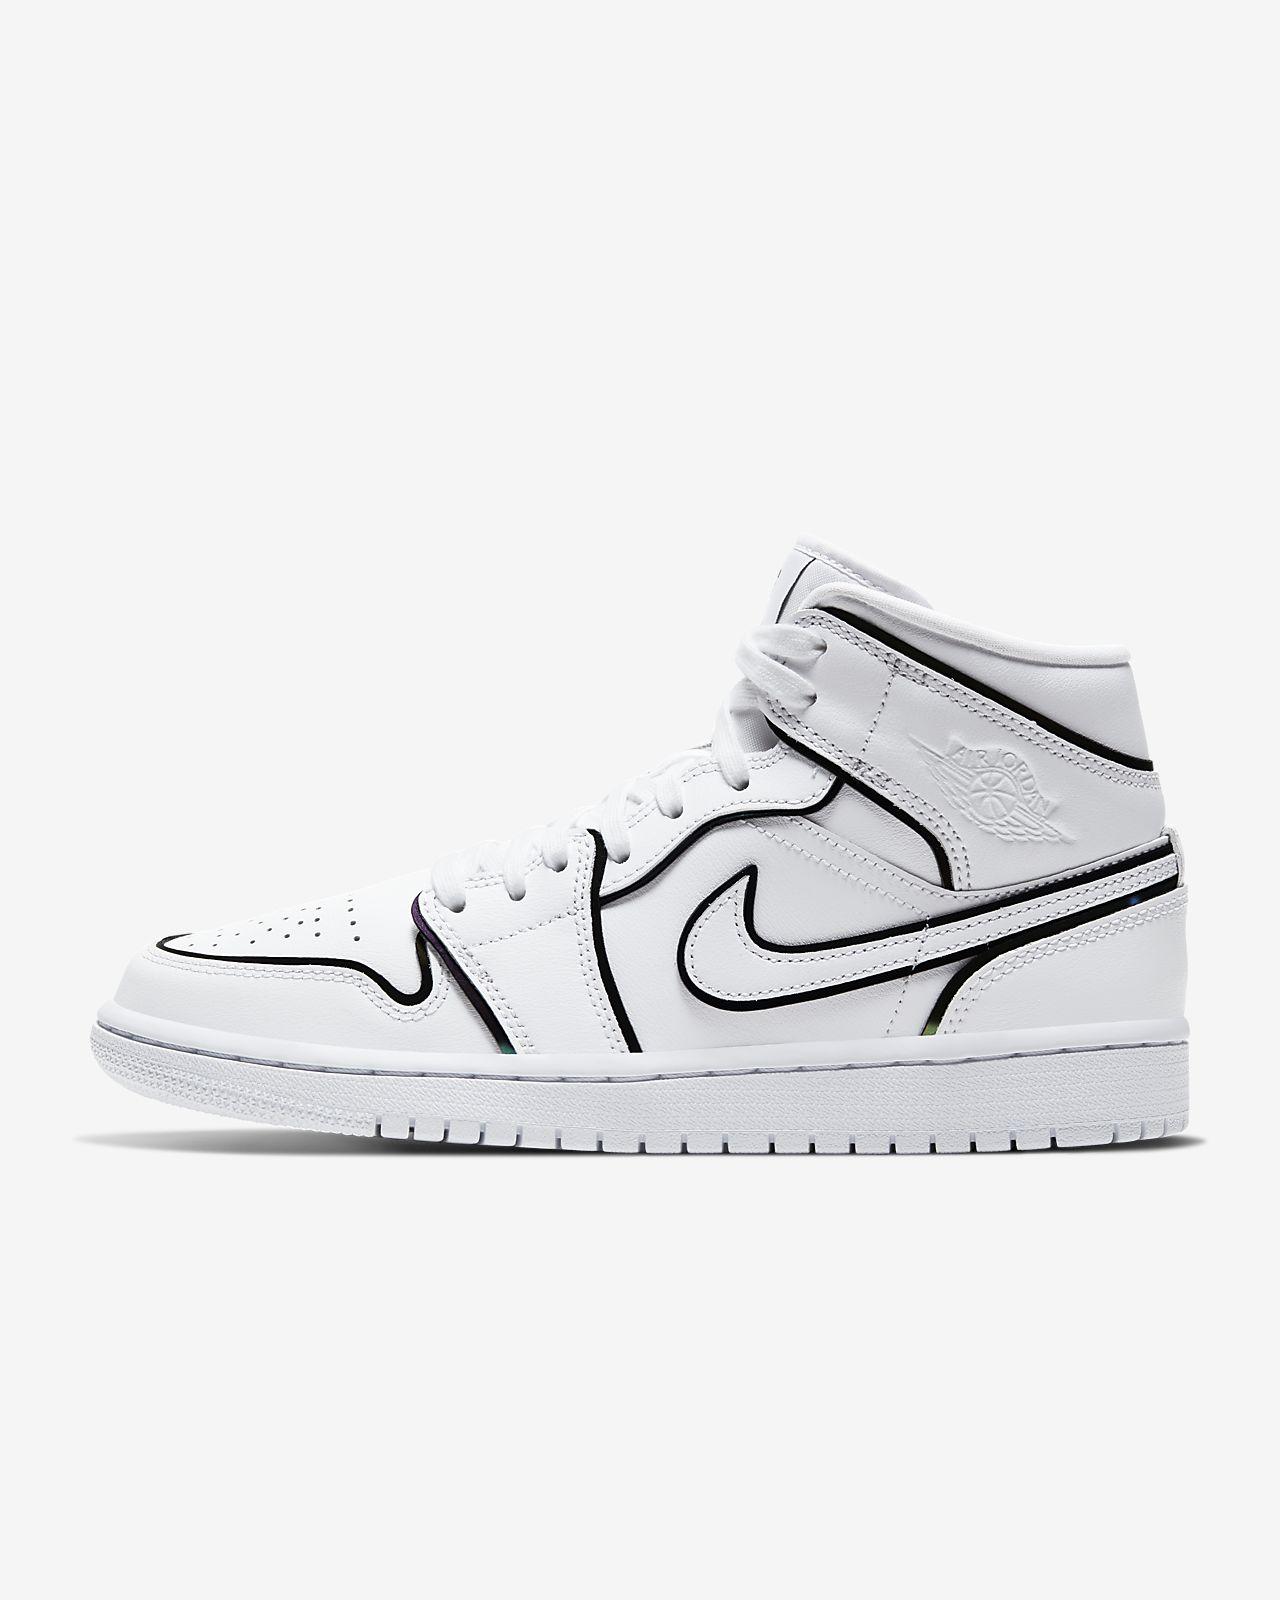 Air Jordan 1 Mid SE Women's Shoe.Online